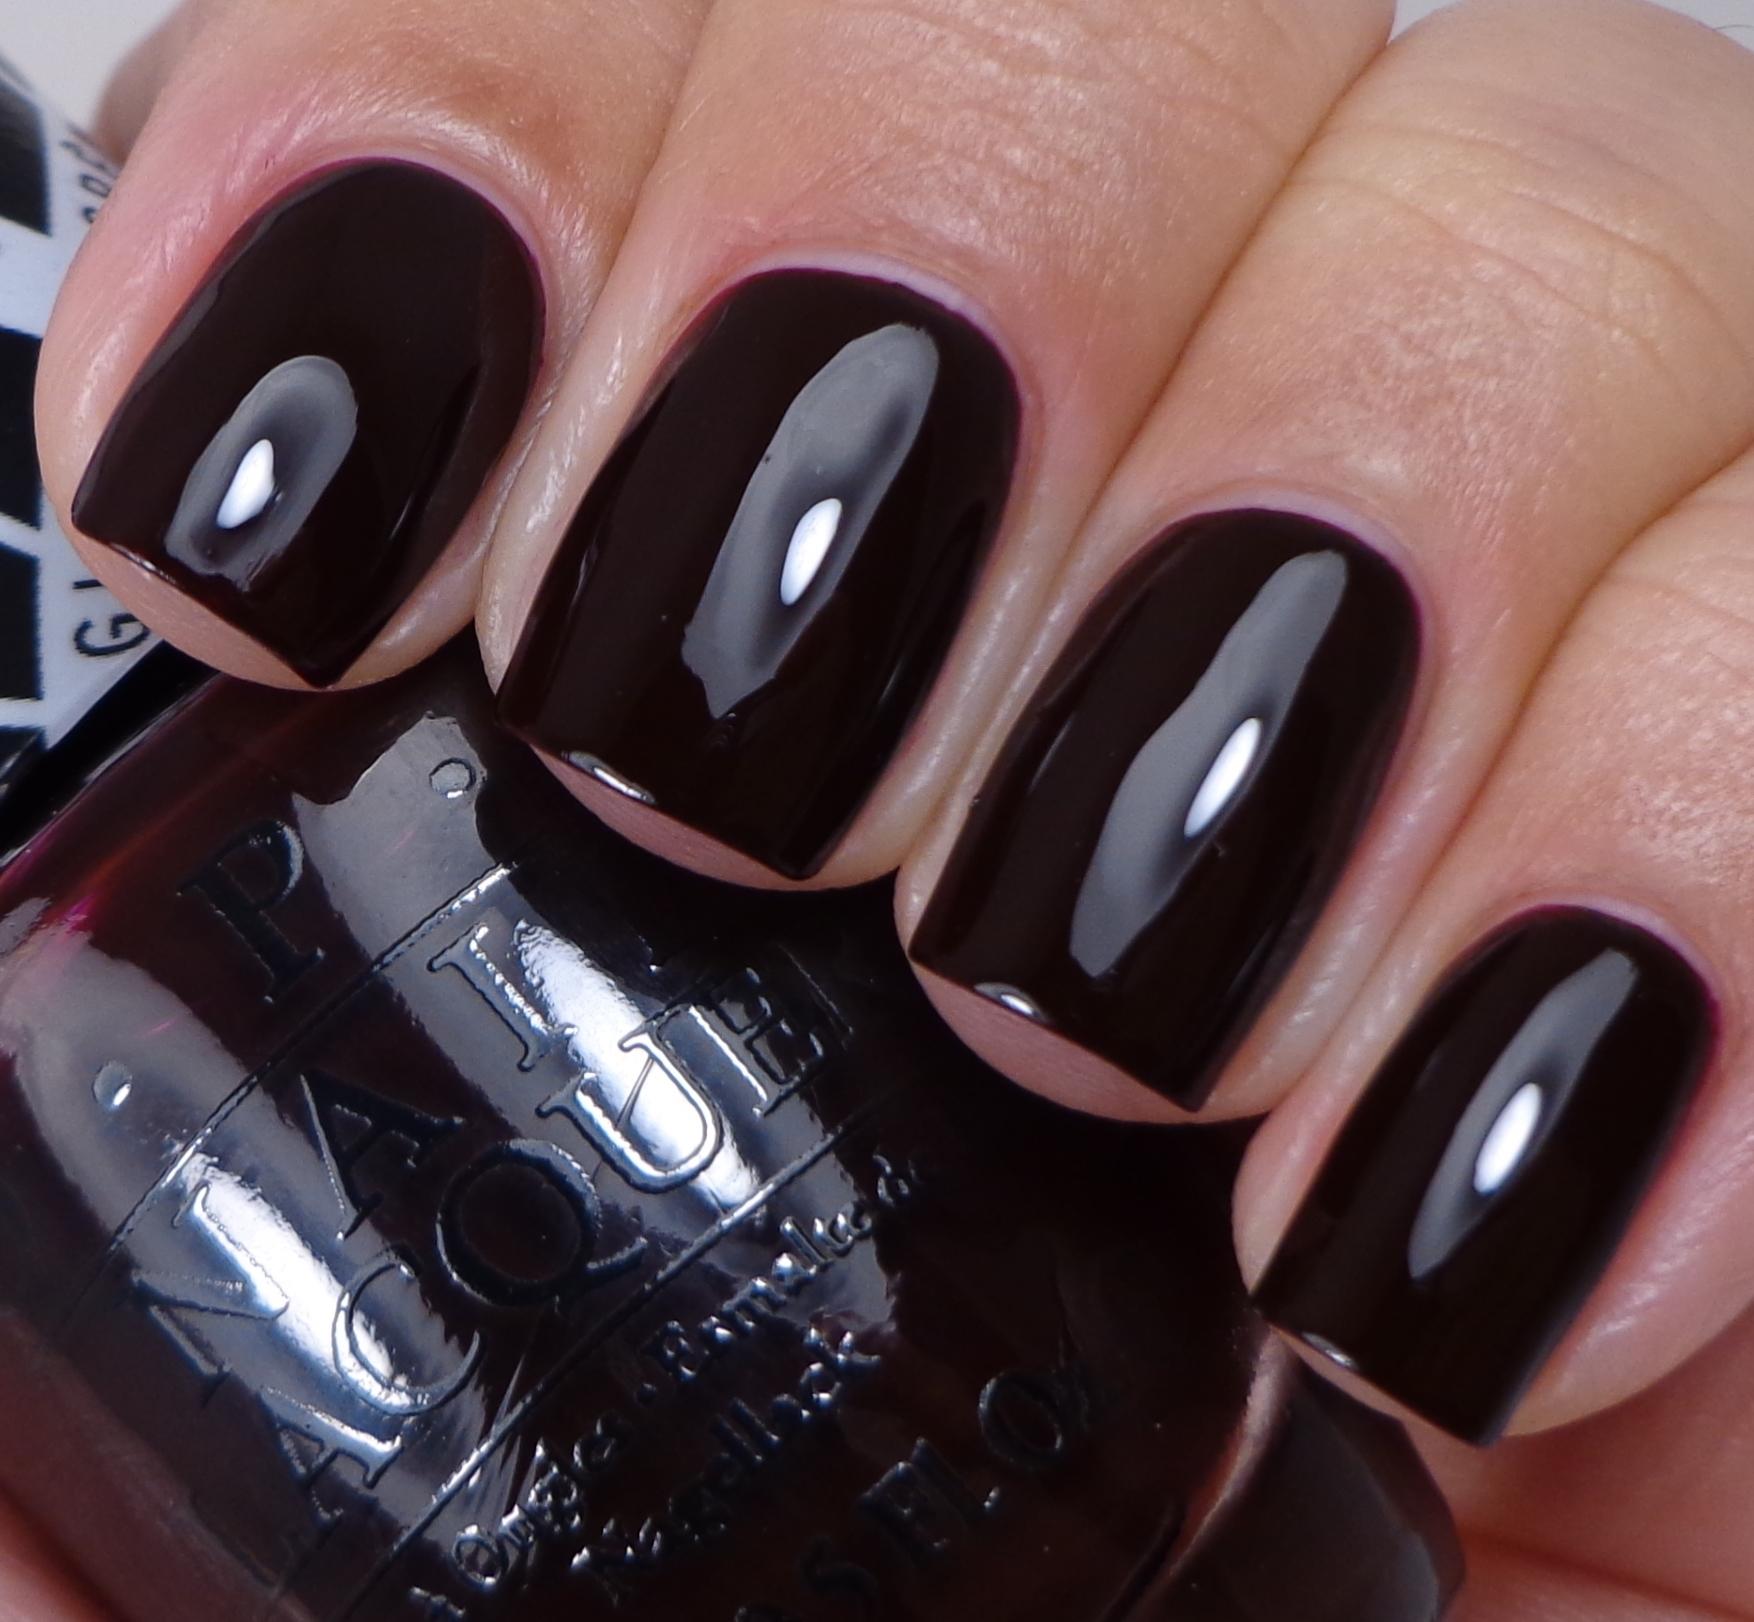 Black Nail Polish Colors: Gwen Stefani By OPI Collection